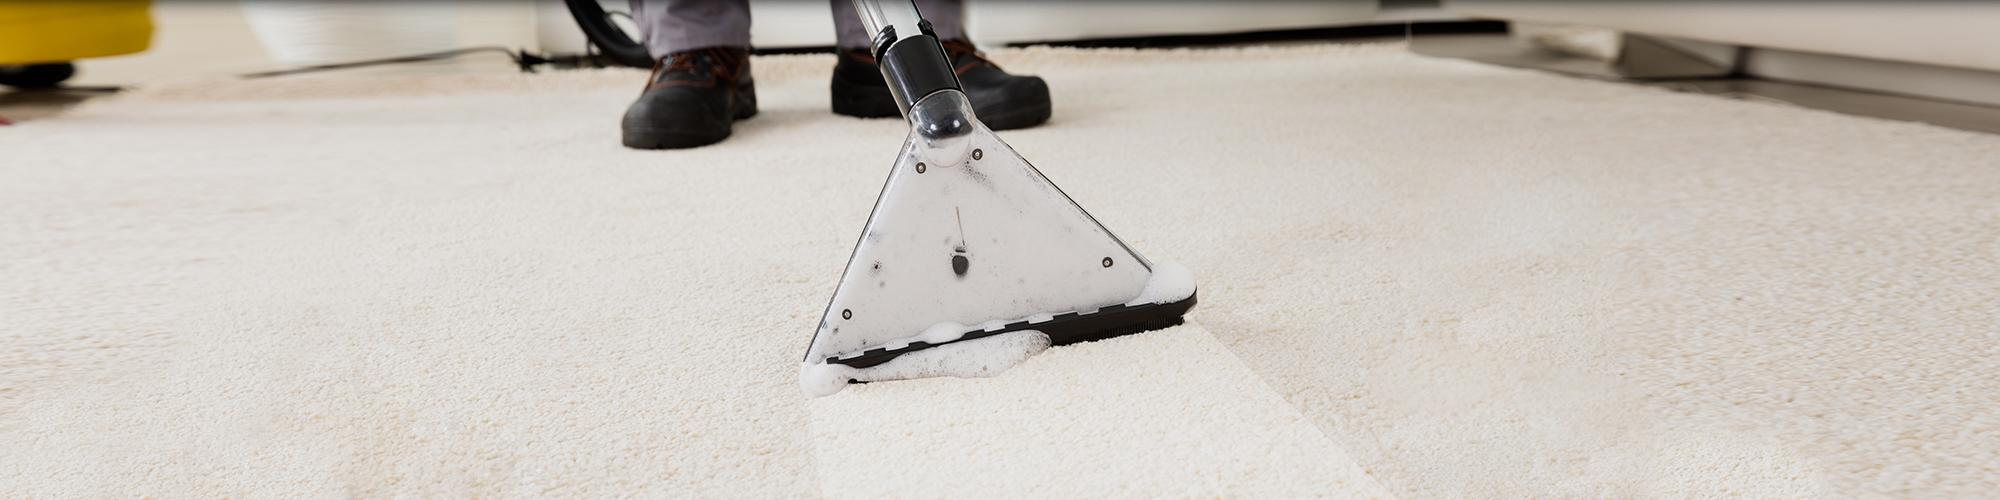 Carpet Cleaner Brunswick Georgia Www Resnooze Com